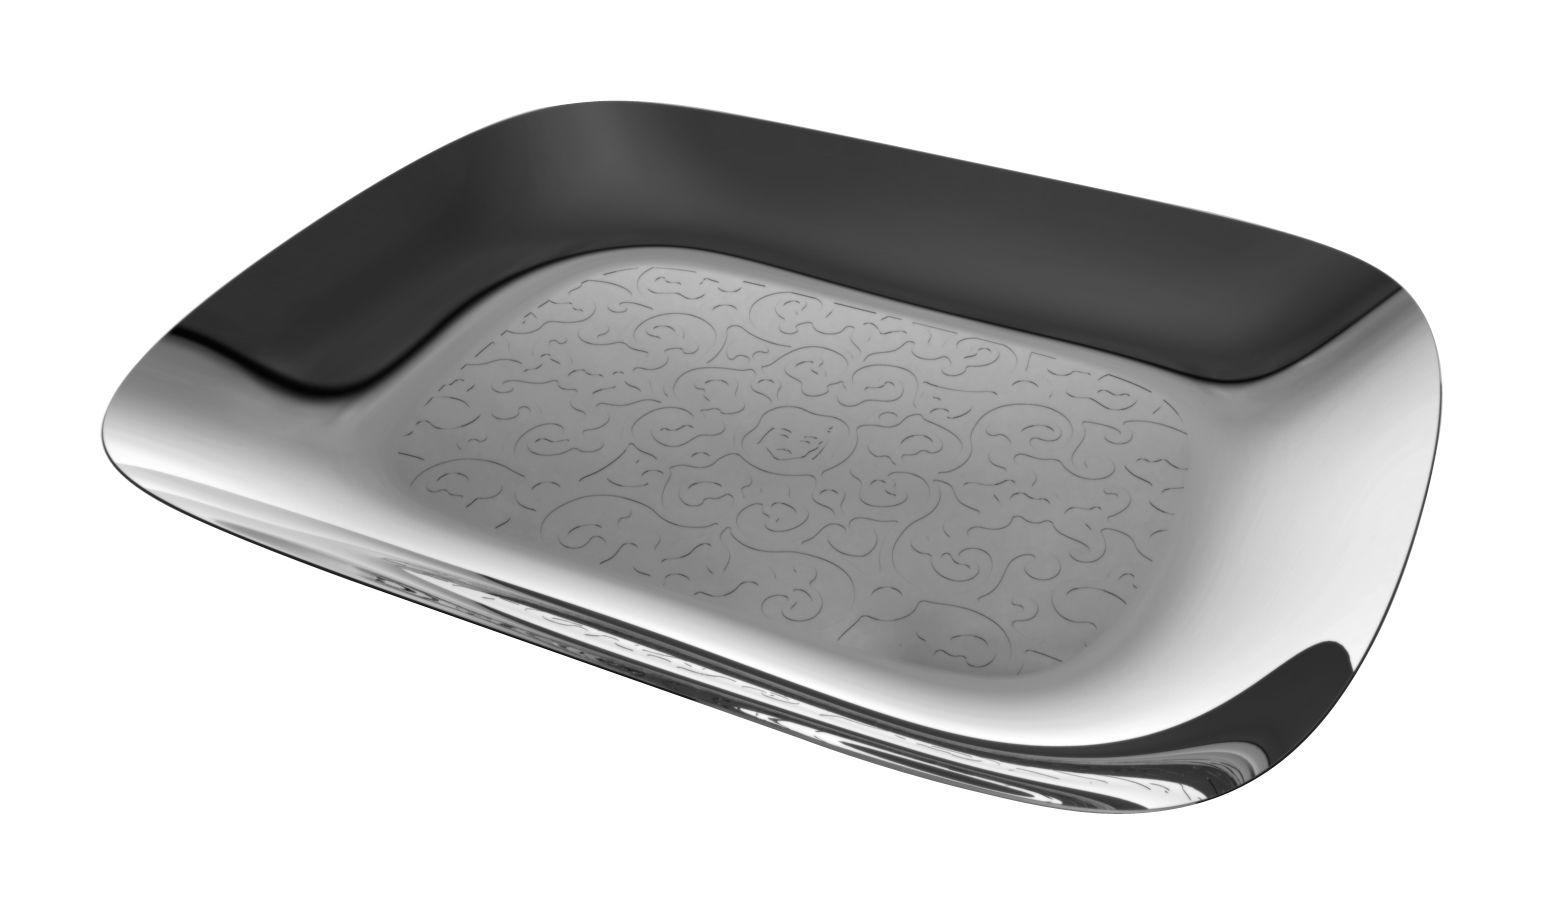 Tischkultur - Tabletts - Dressed Tablett rechteckig, 45 x 34 cm - Alessi - 45 x 34 cm - polierter Stahl - Acier inoxydable brillant